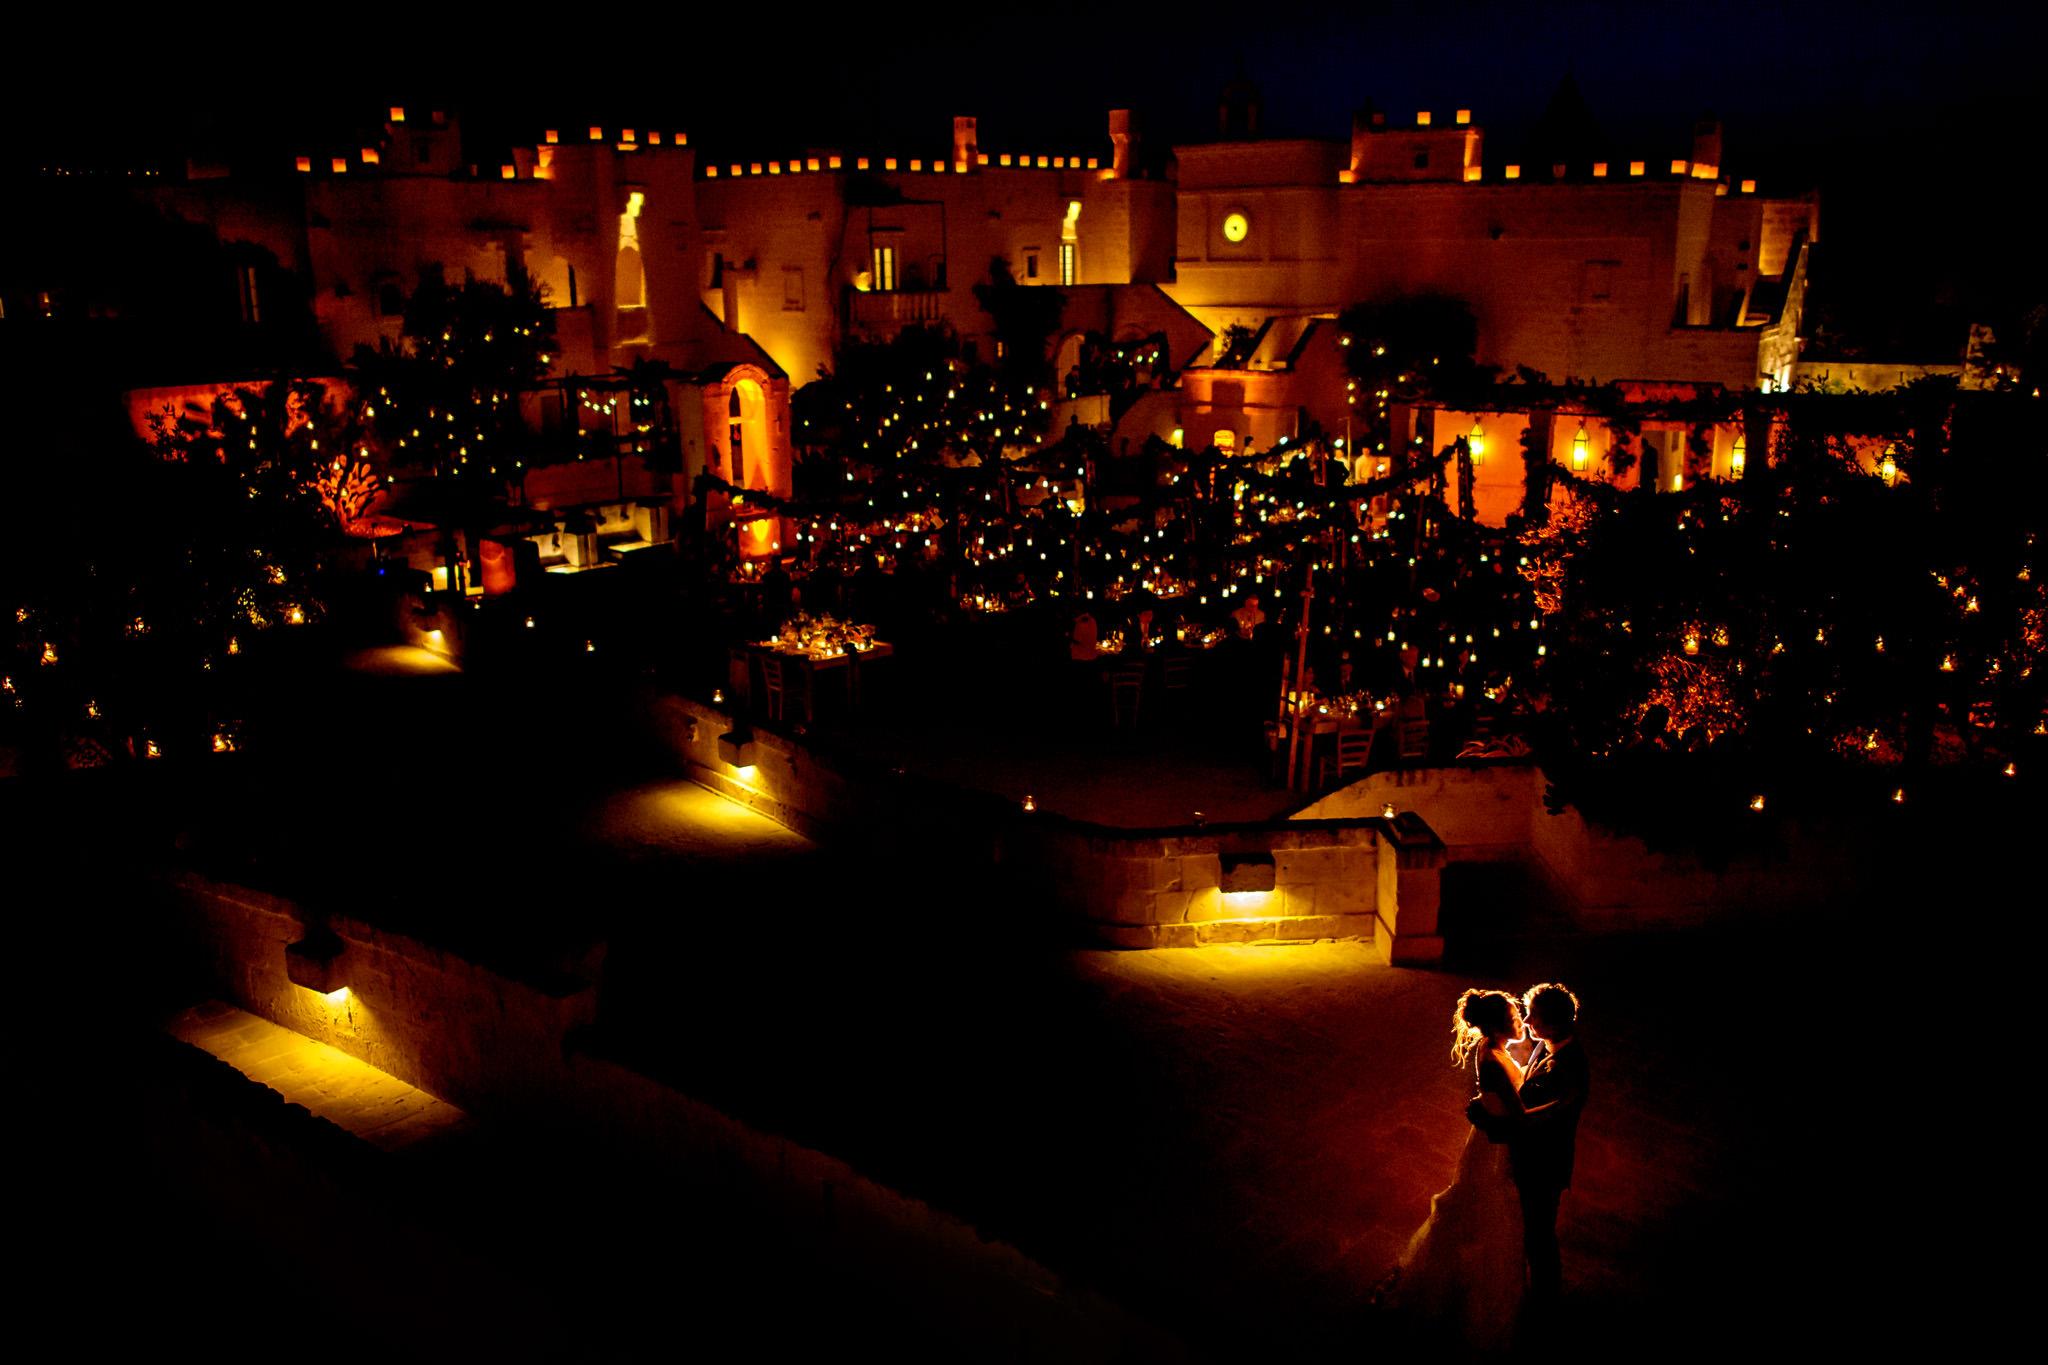 Lily and David's wedding at Borgo Egnazia in Puglia, Italy.